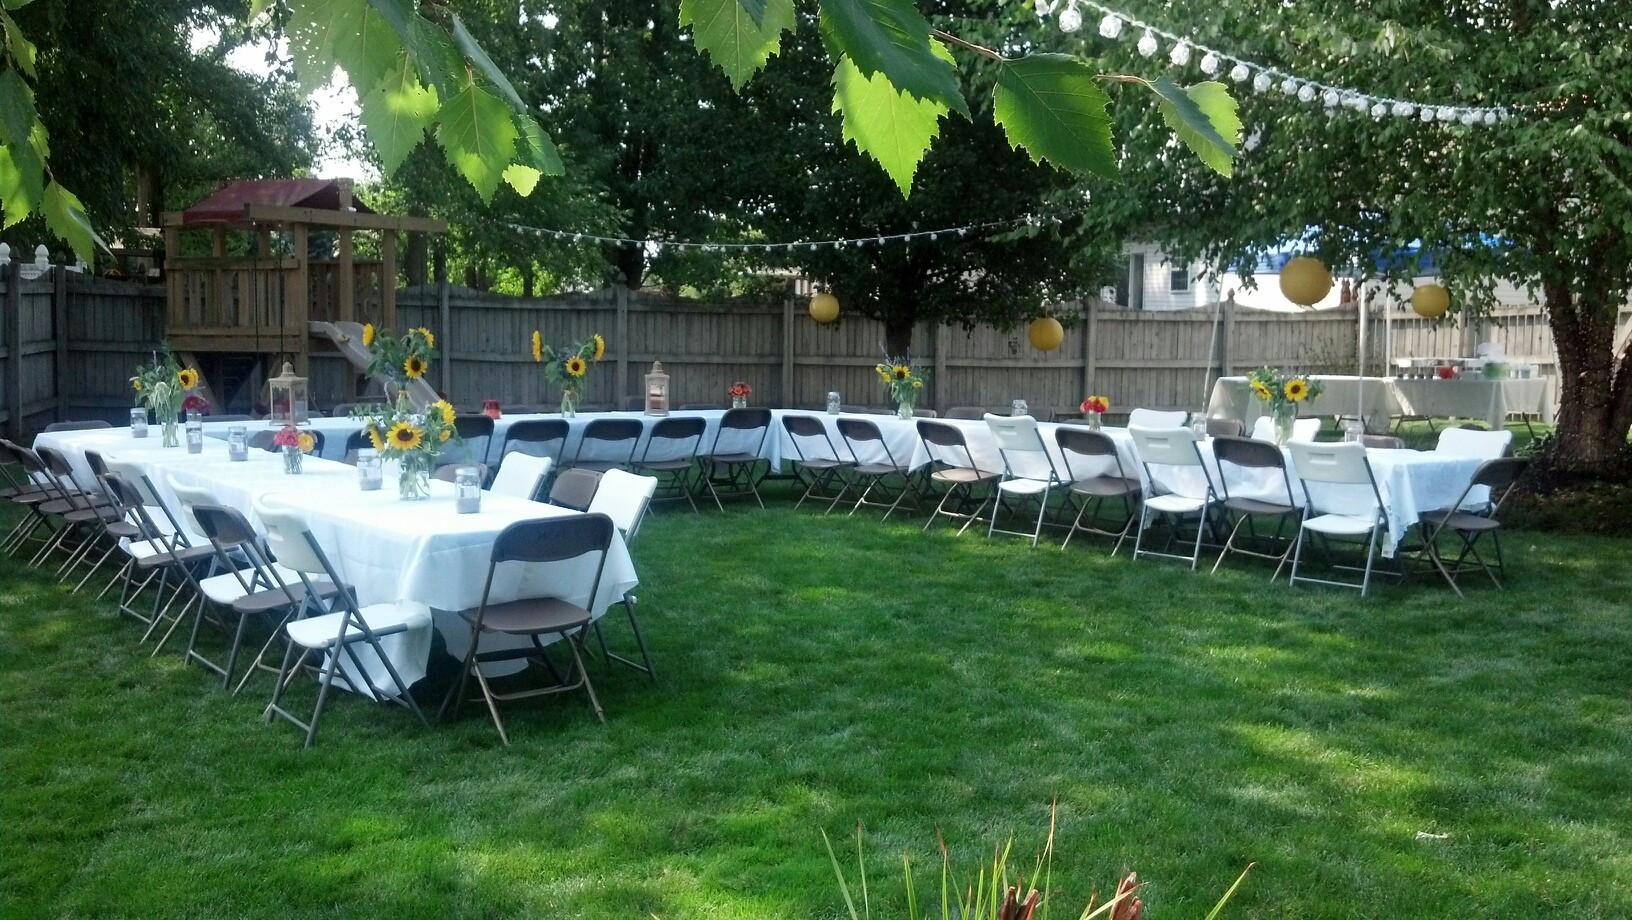 Backyard Party Ideas For Graduation  Graduation Party Ideas on a Bud